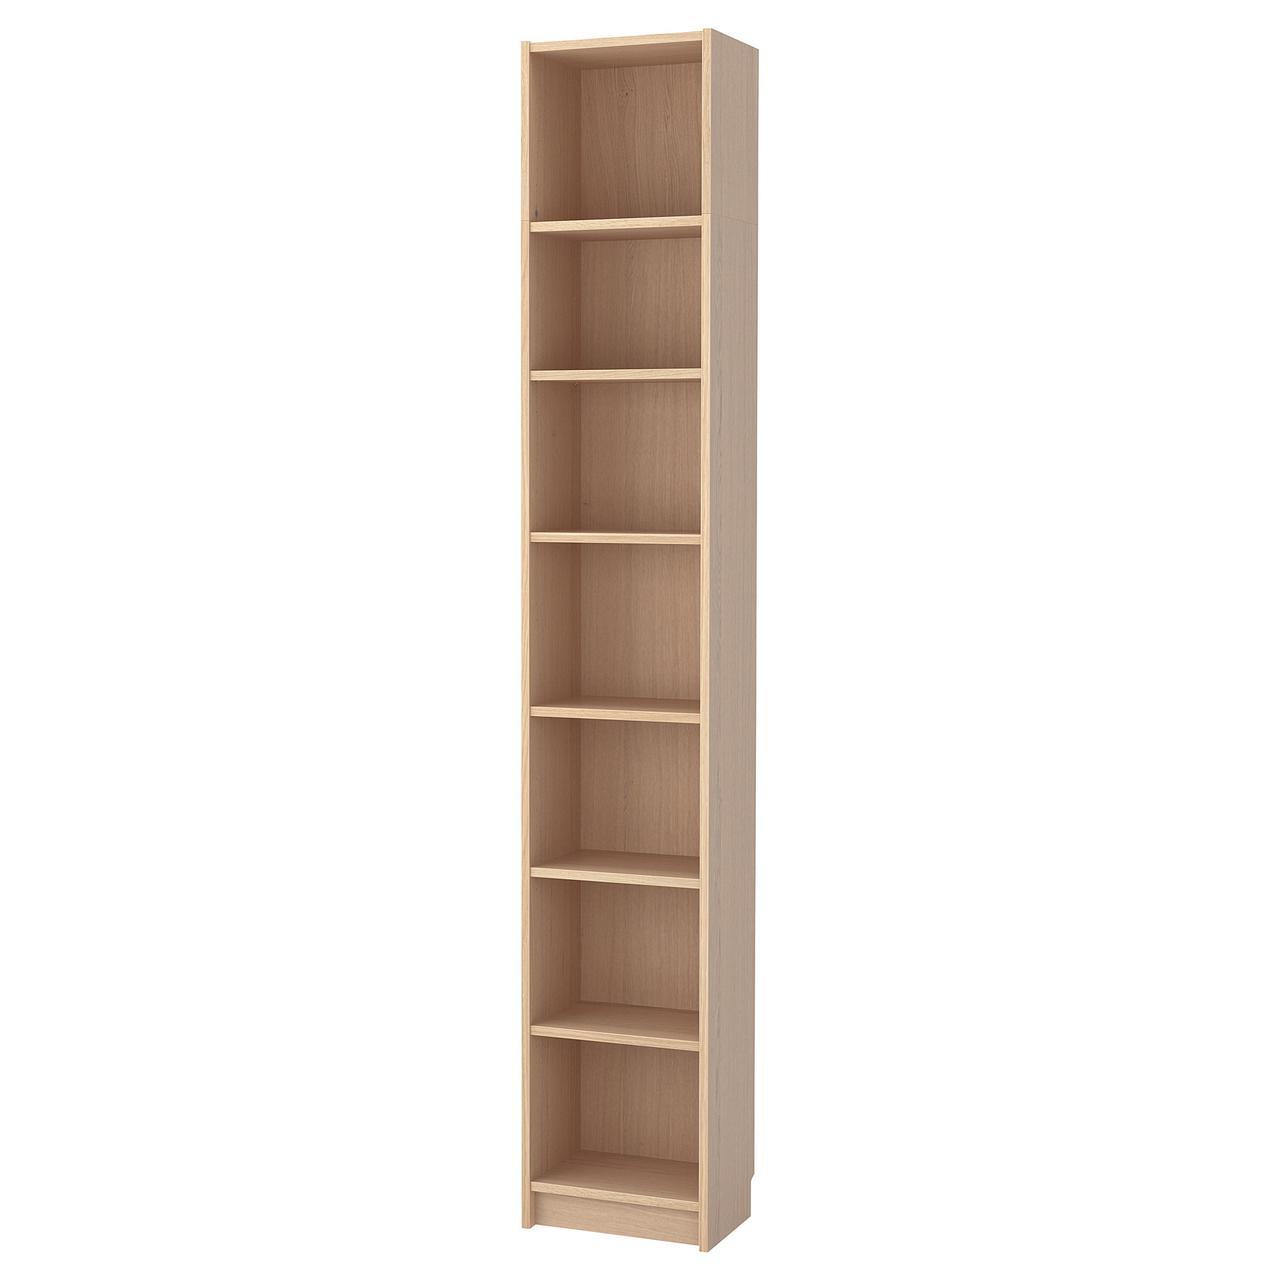 Стеллаж IKEA BILLY 40x237x28 см дубовый шпон 392.499.38